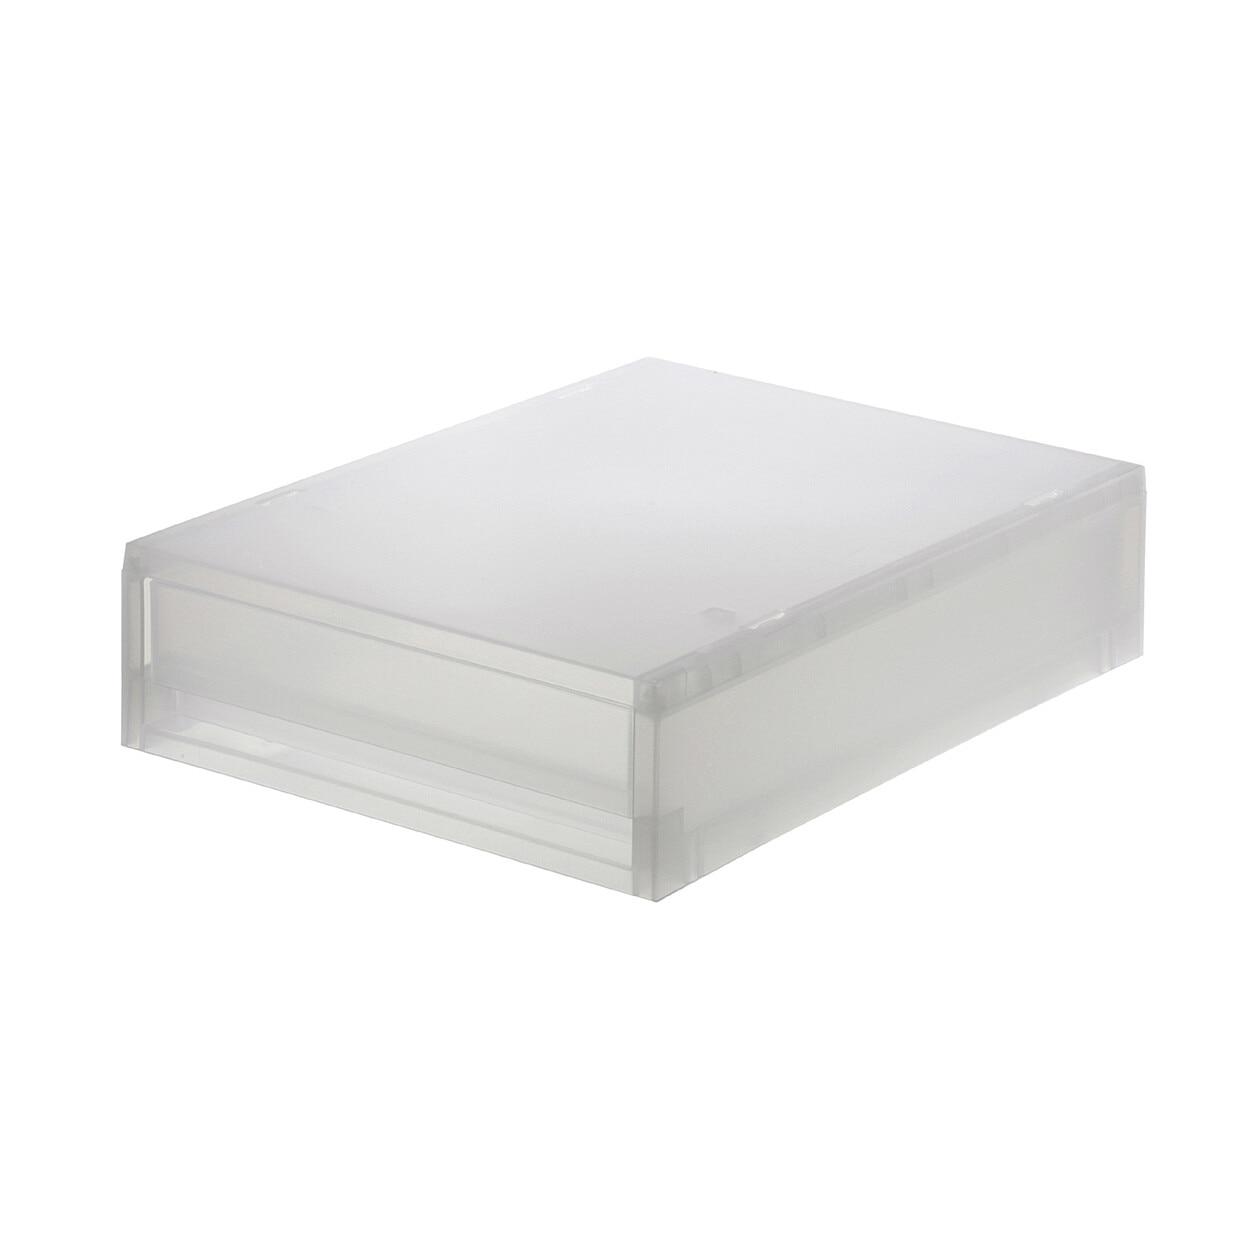 RoomClip商品情報 - ポリプロピレンケース引出式・薄型・縦 透過